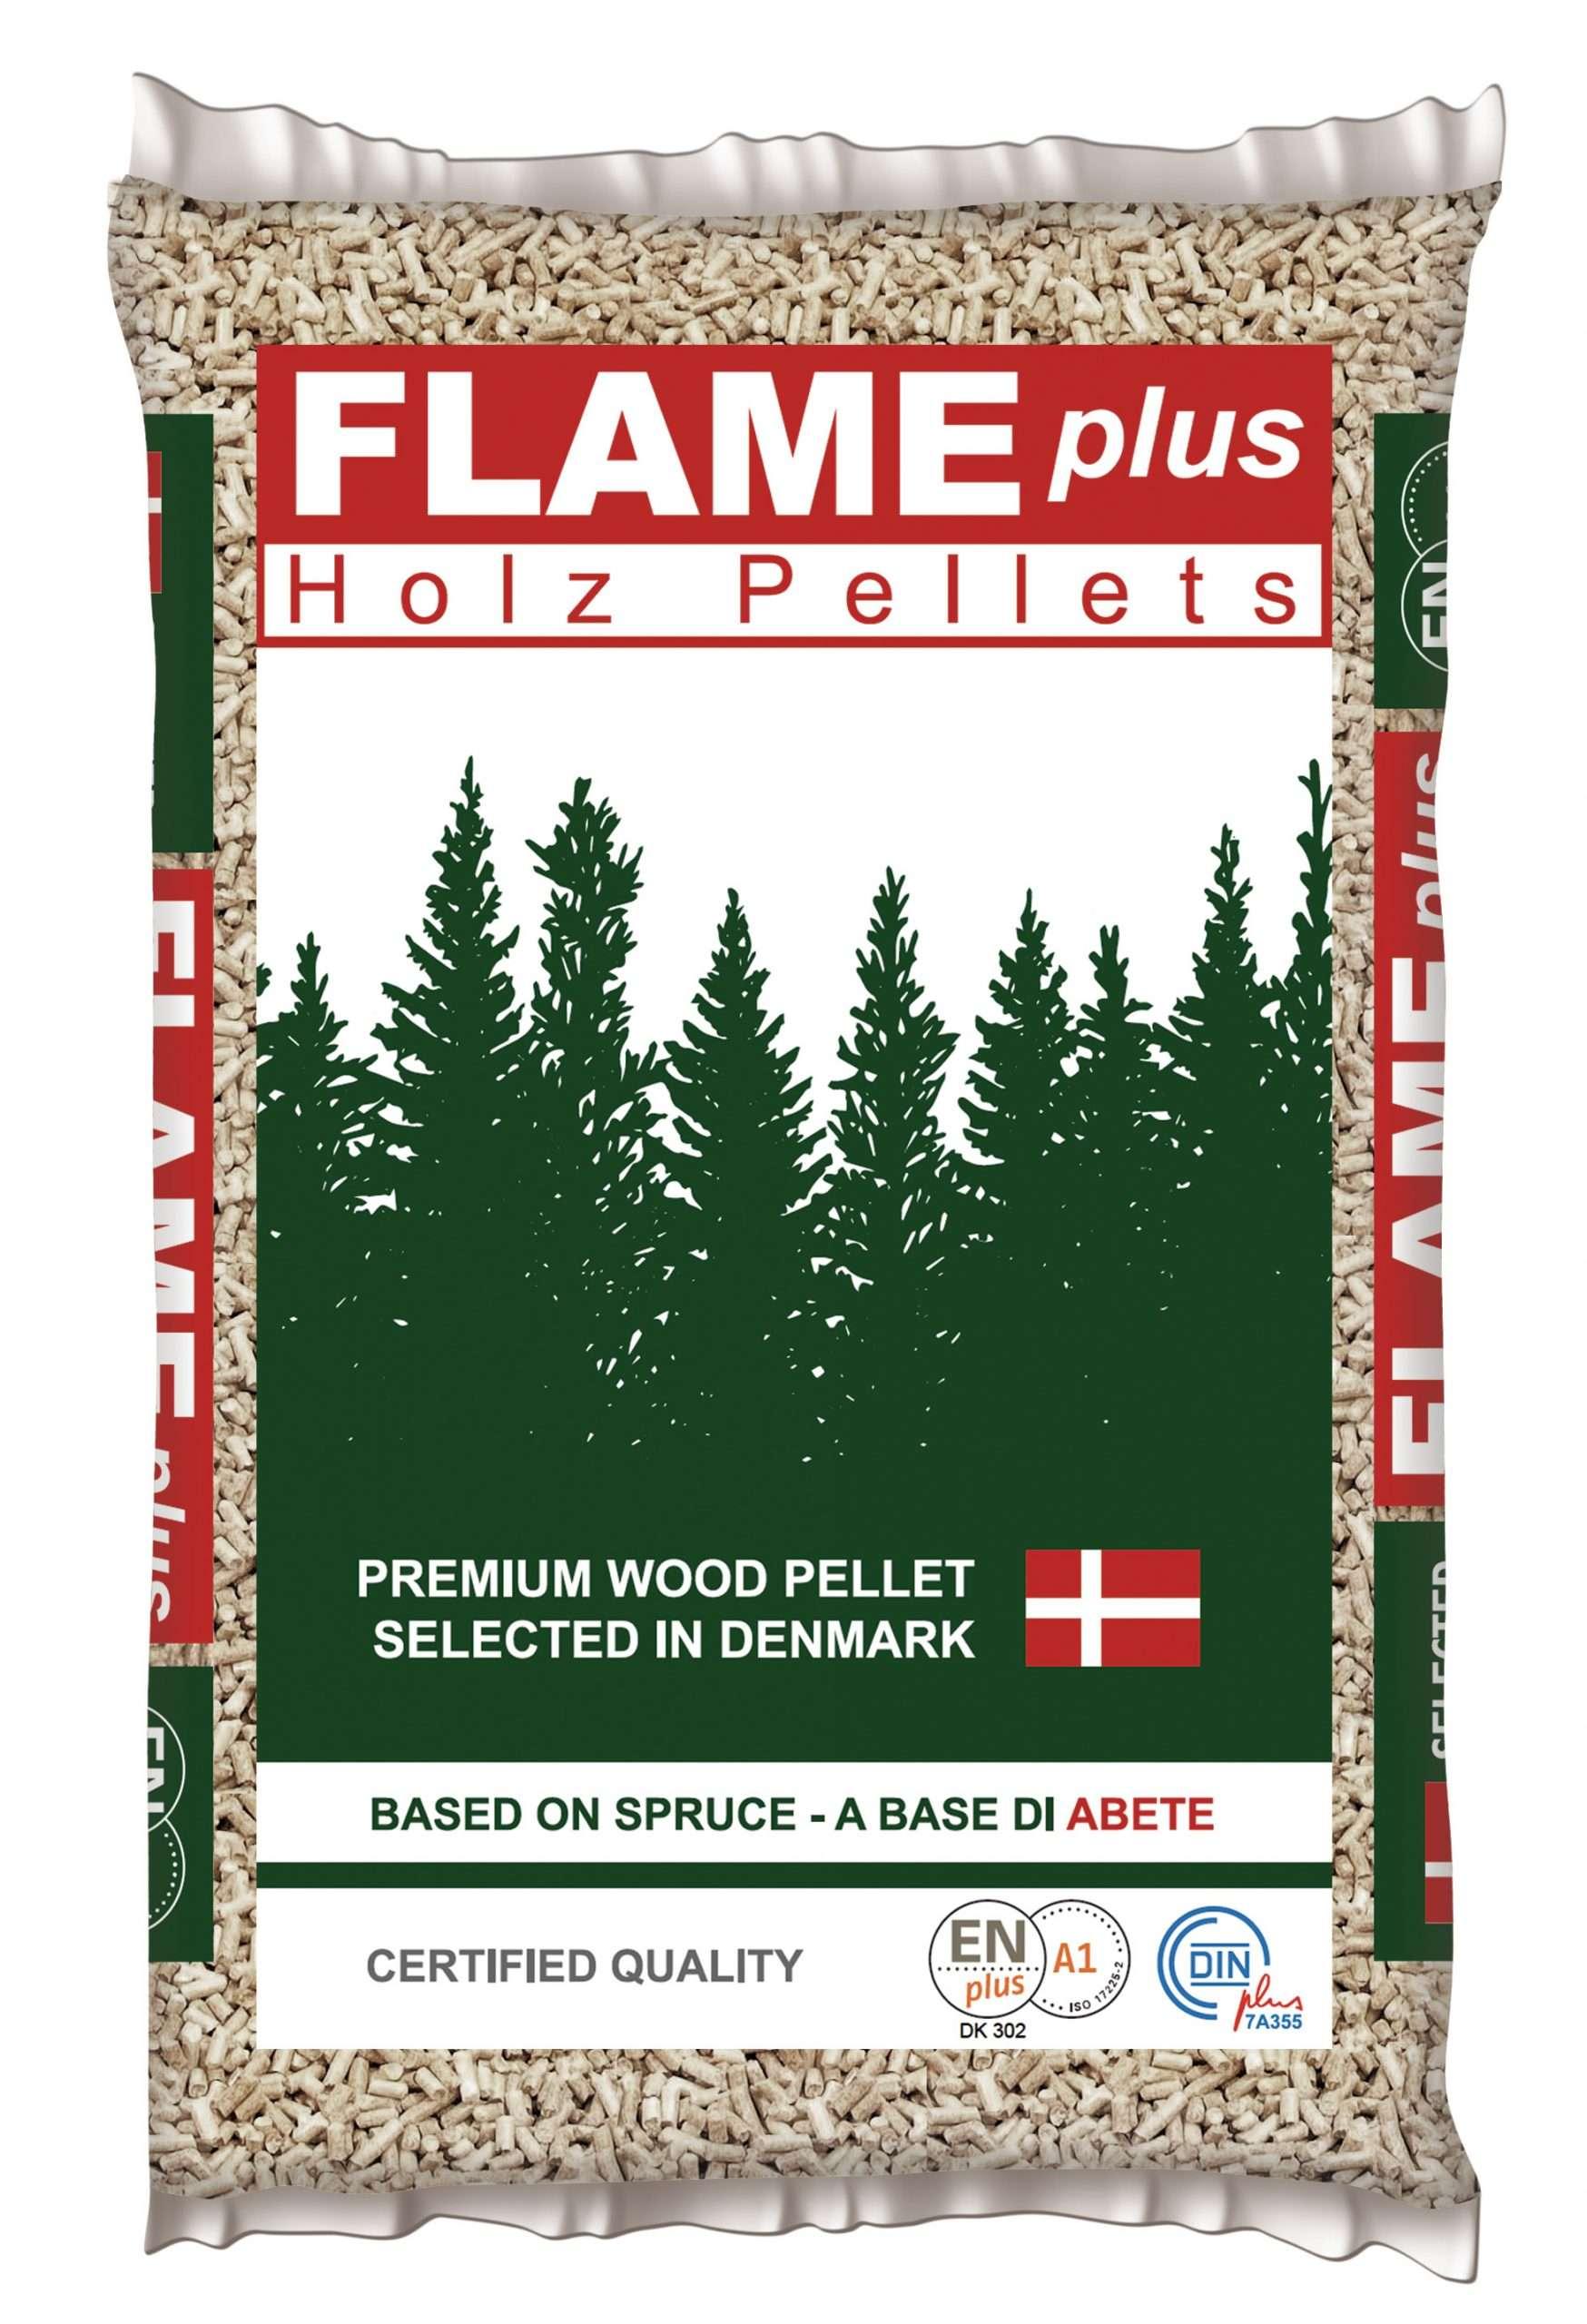 Sacchetto Flame kg 15